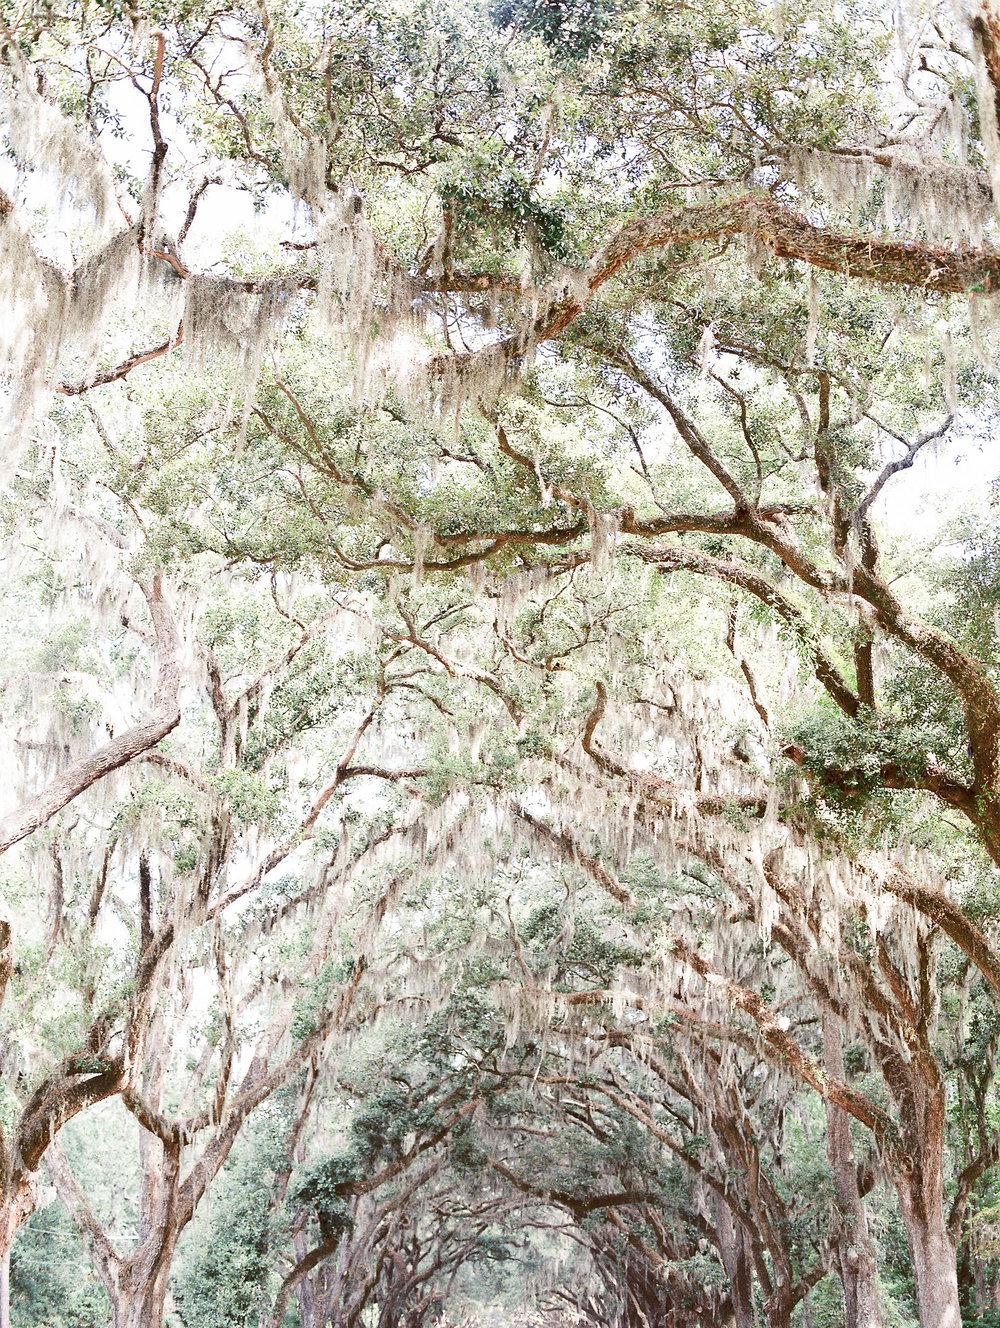 Lura-james-wormsloe-historic-site-hannah-forsberg-atlanta-wedding-photographer-22.jpg